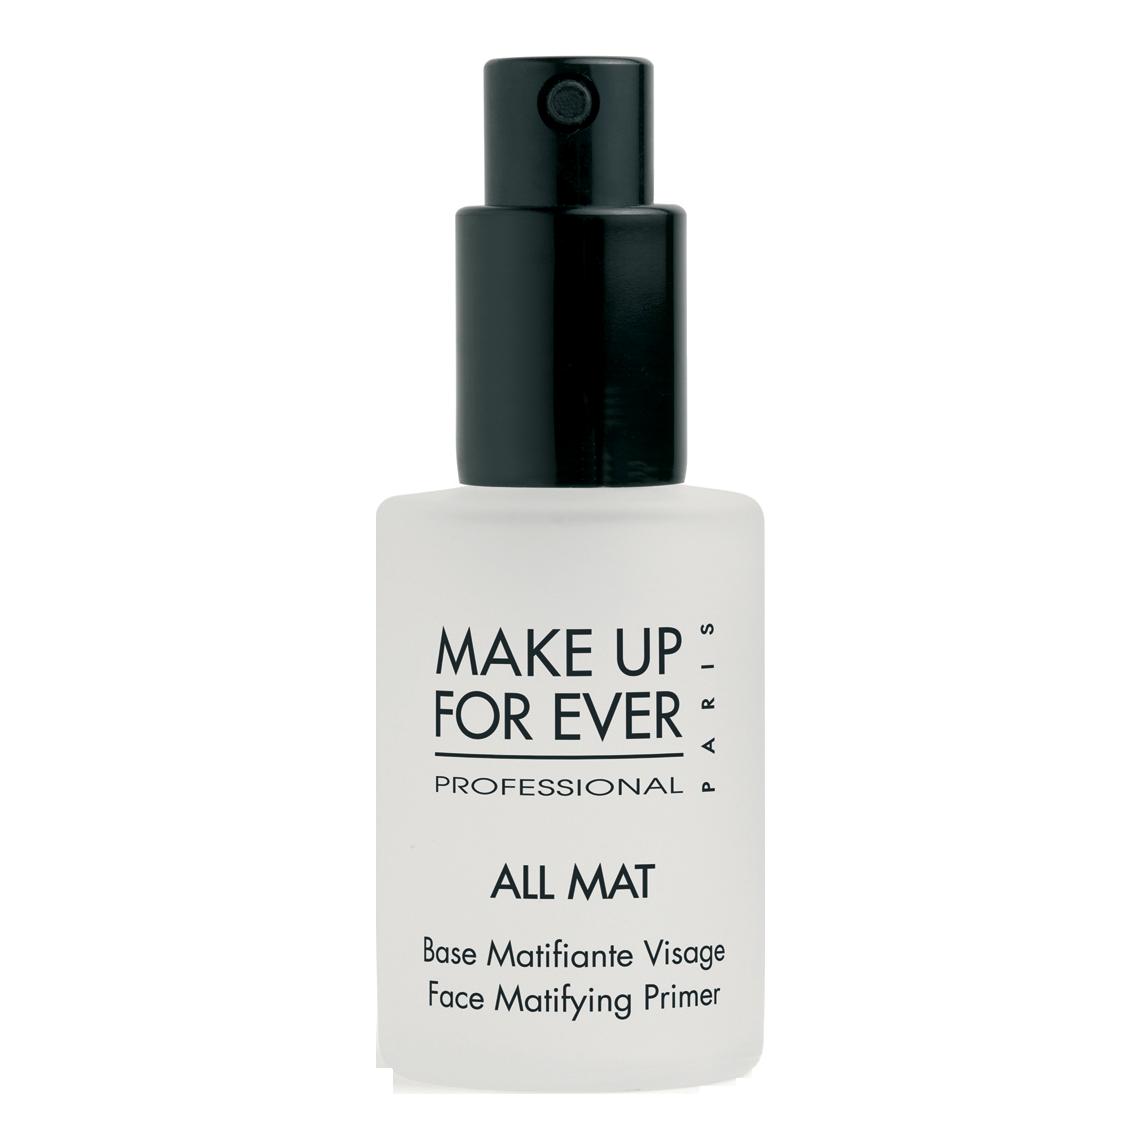 Professional Matte Makeup Primer 47 Makeup For Ever Primer Makeup Makeup Skin Care